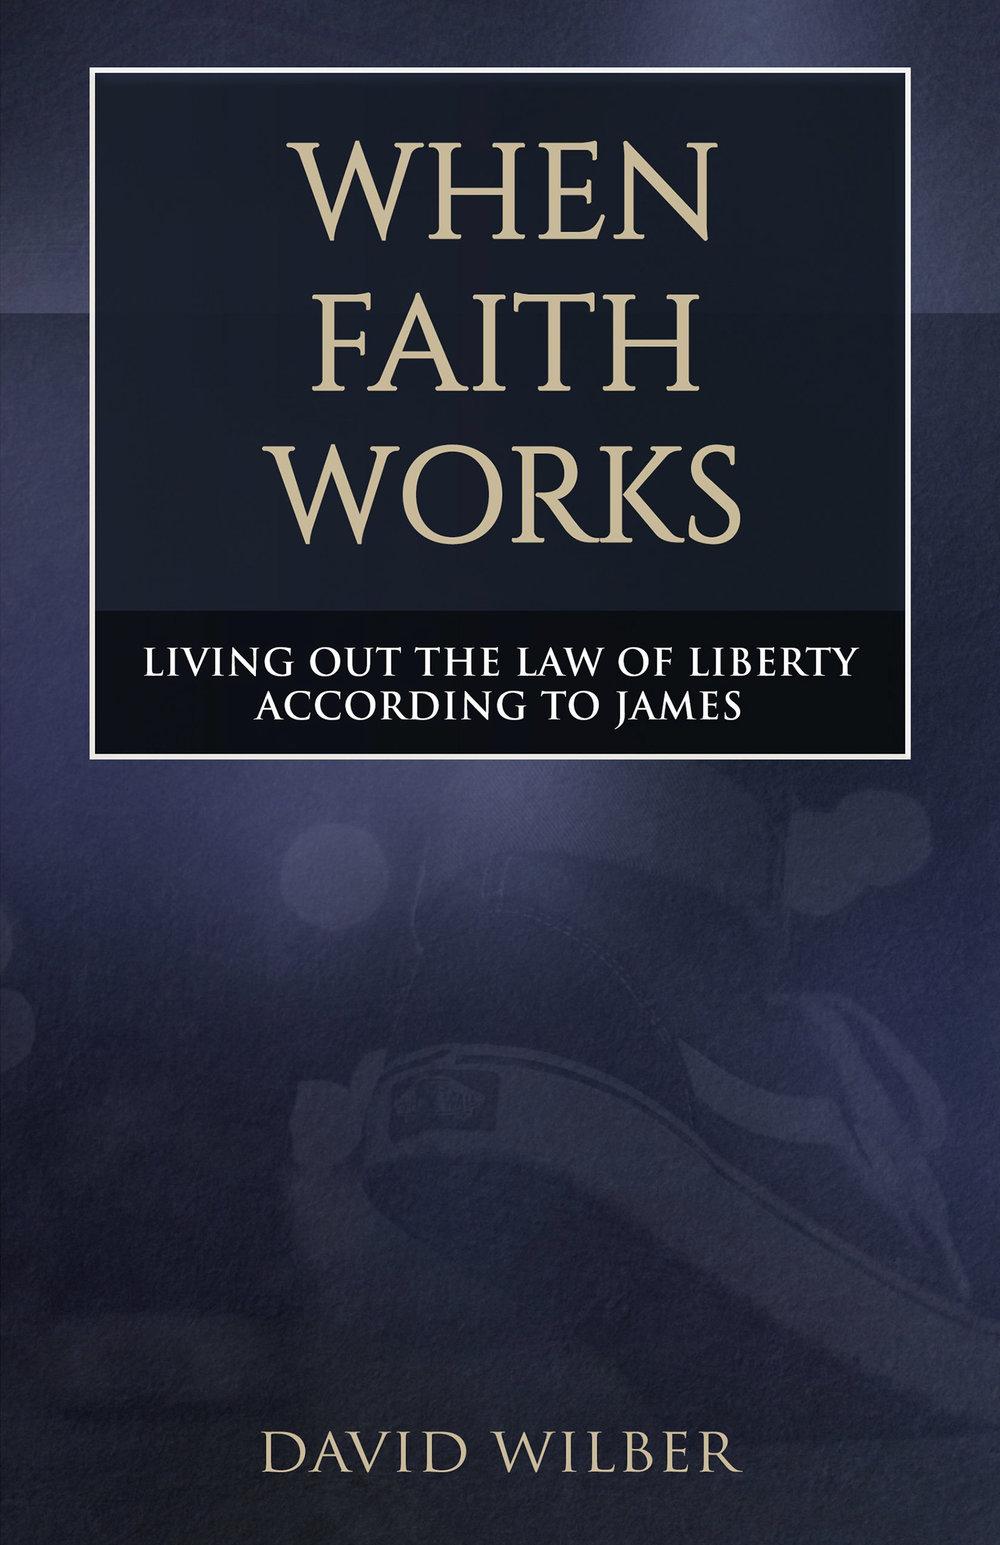 David_Wilber_when_faith_works.jpg